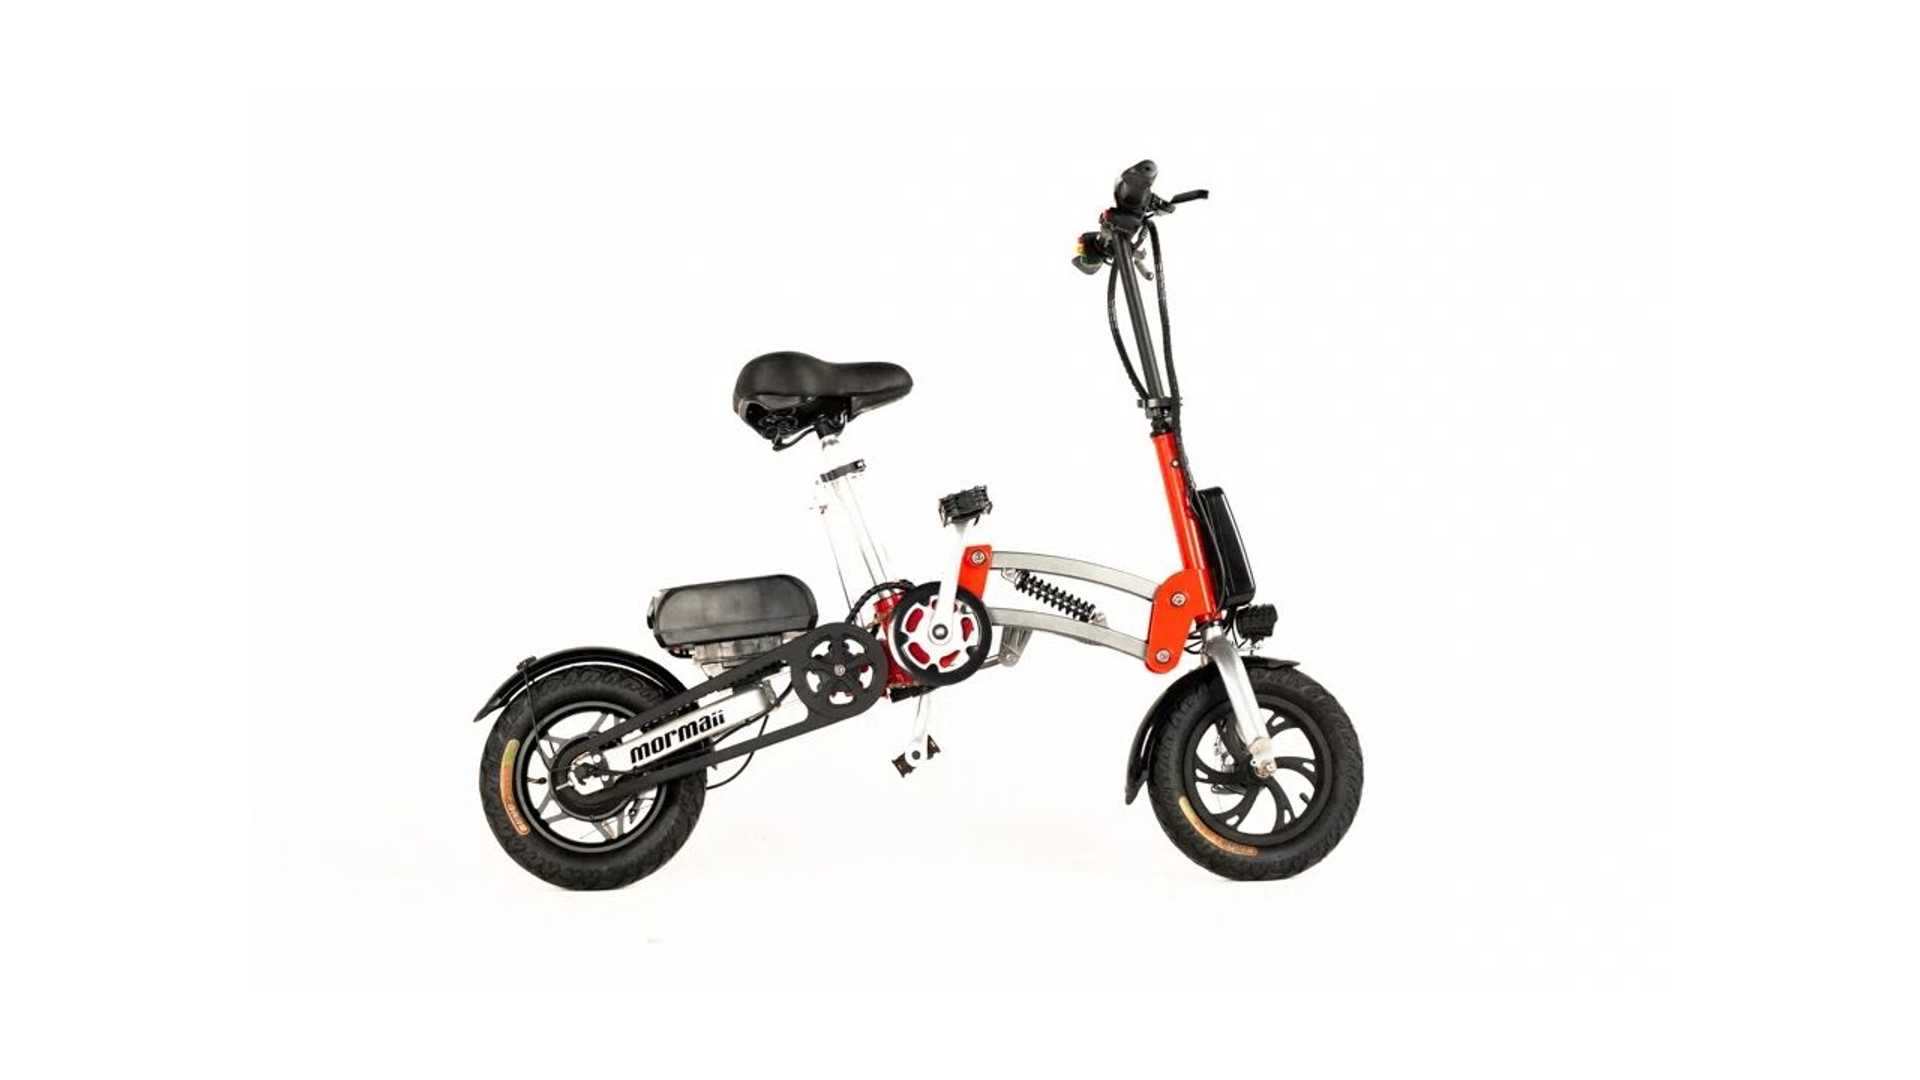 https://cdn.motor1.com/images/mgl/RvG4g/s6/bicicleta-eletrica.jpg